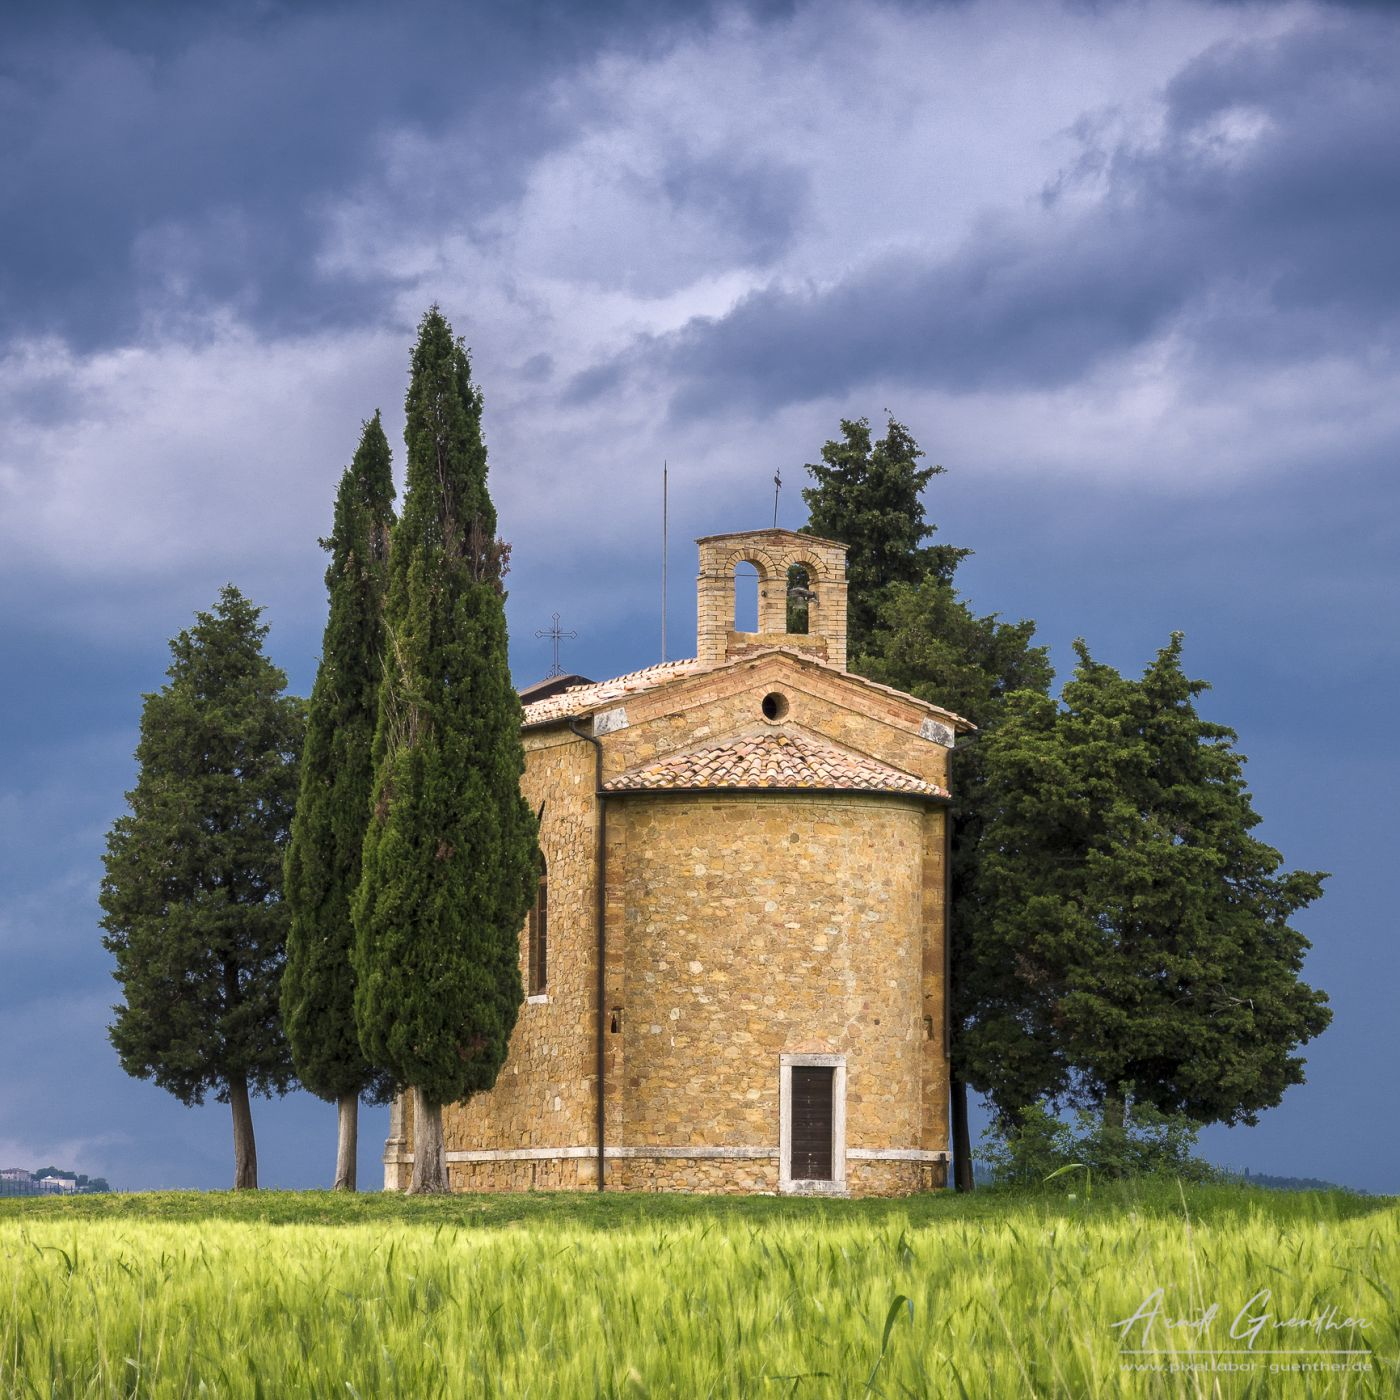 Cappella di Vitaleta, Italy